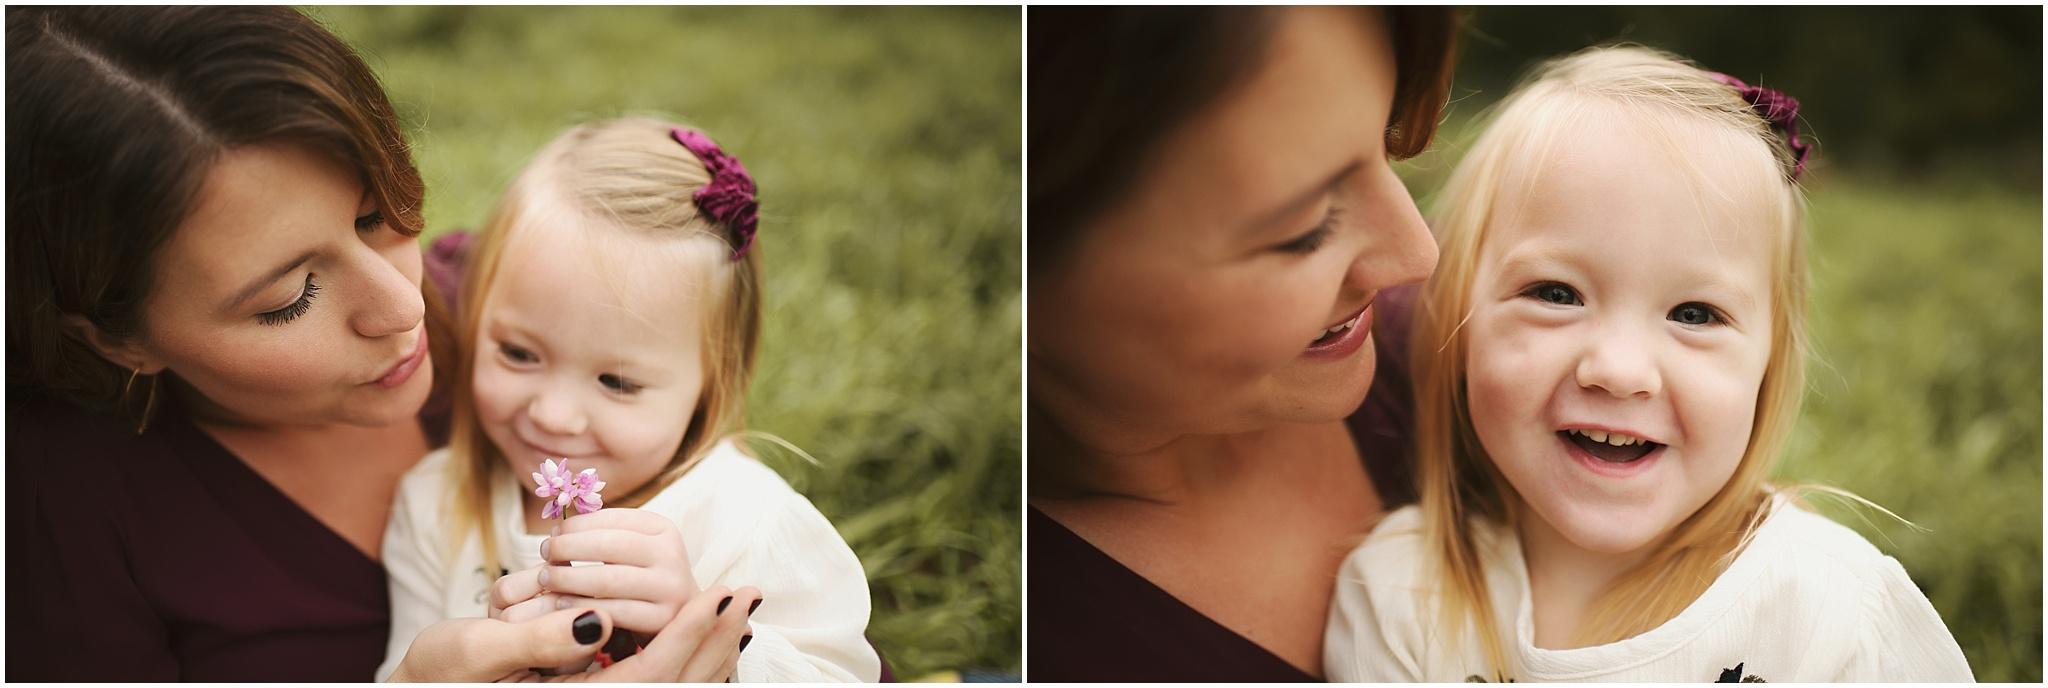 karra lynn photography - family photographer milford mi_0032.jpg